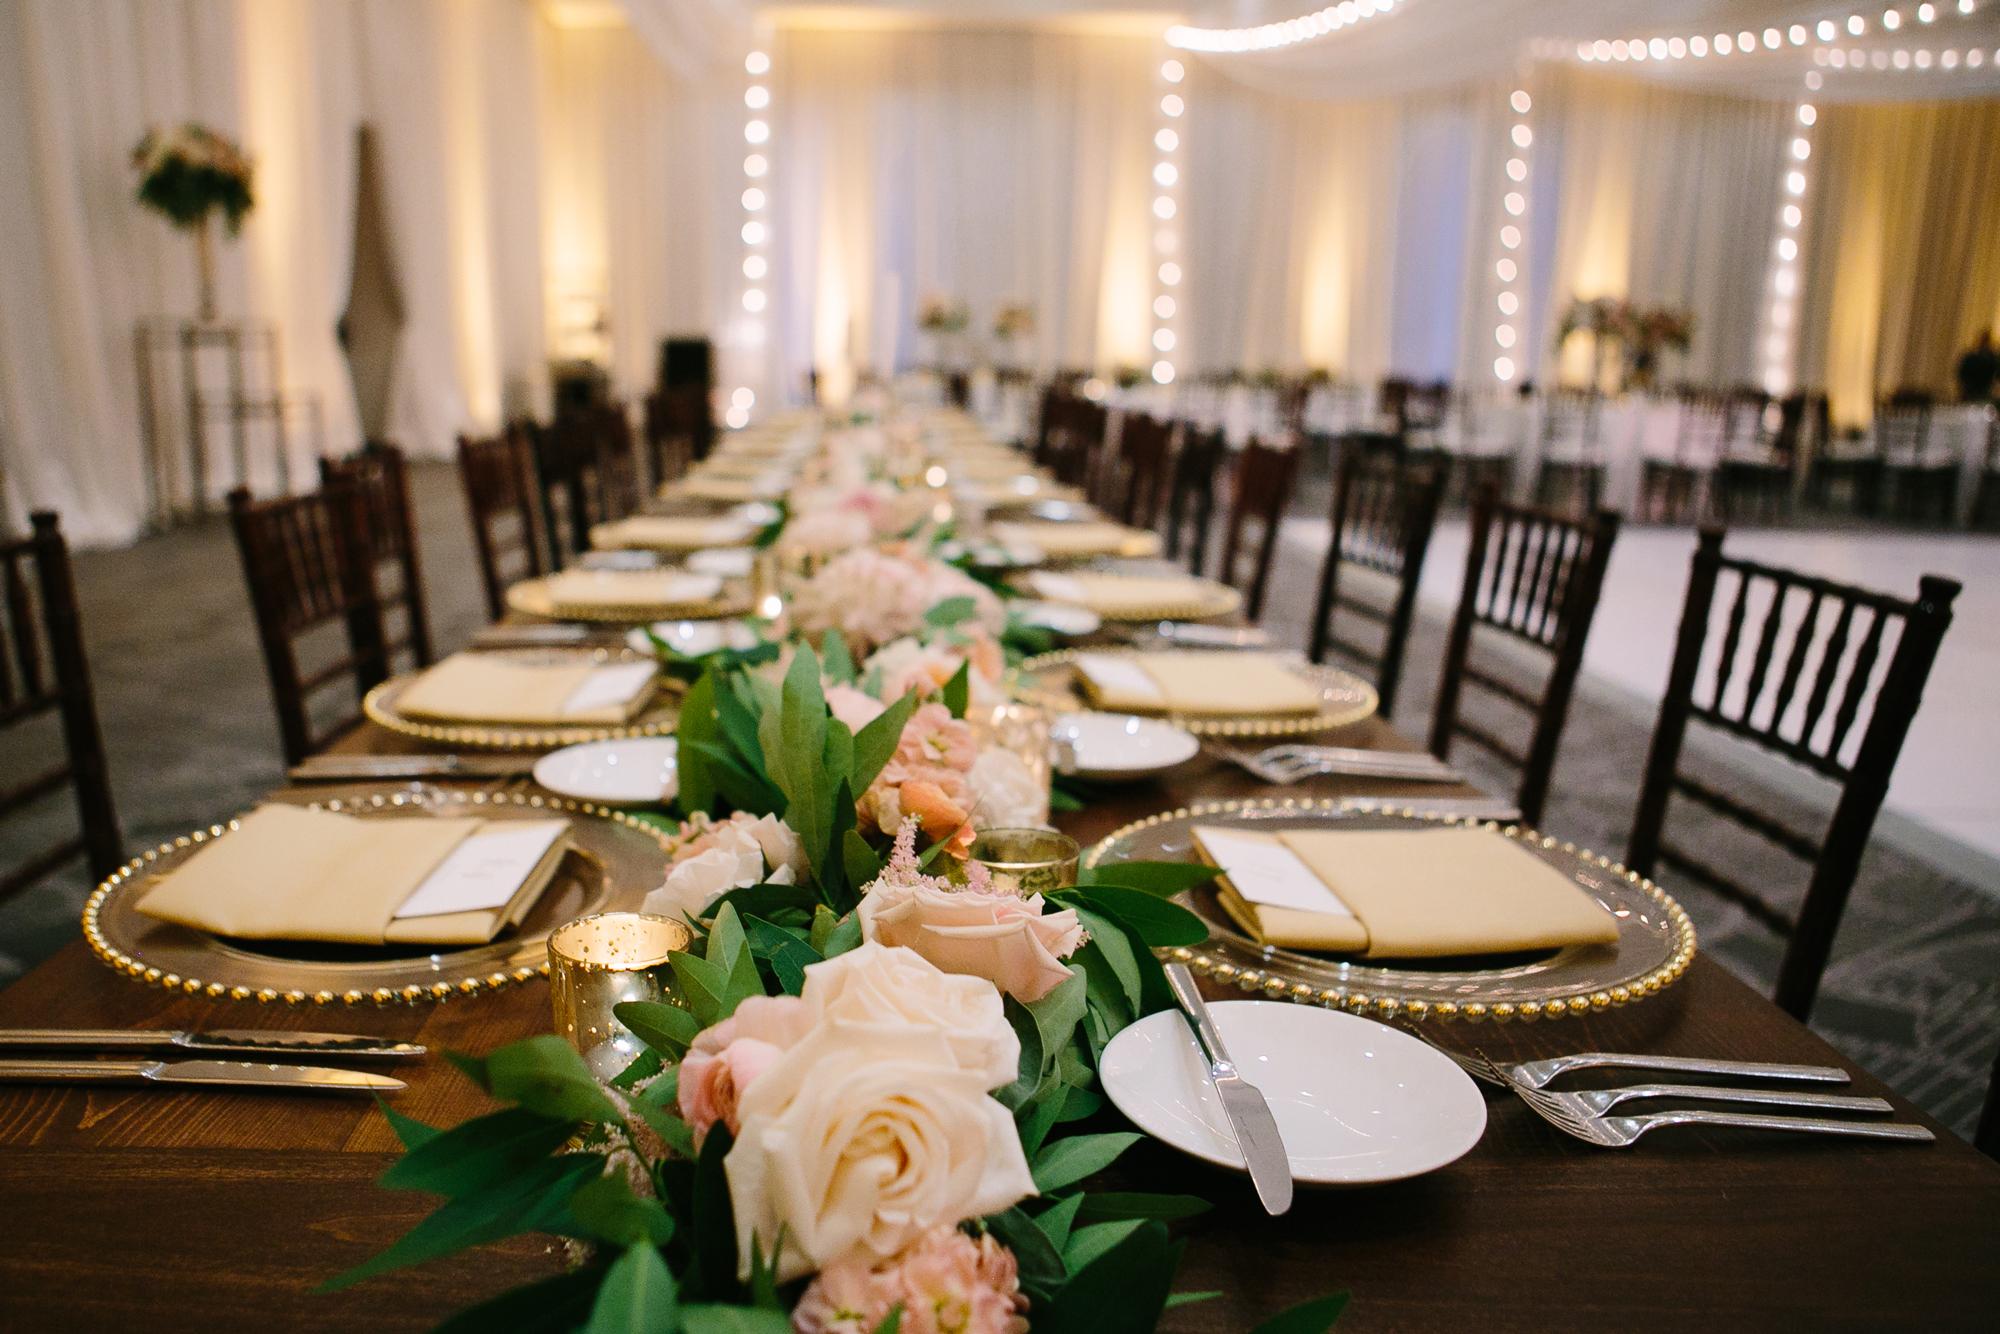 Amy Zaroff - At First Blush Wedding